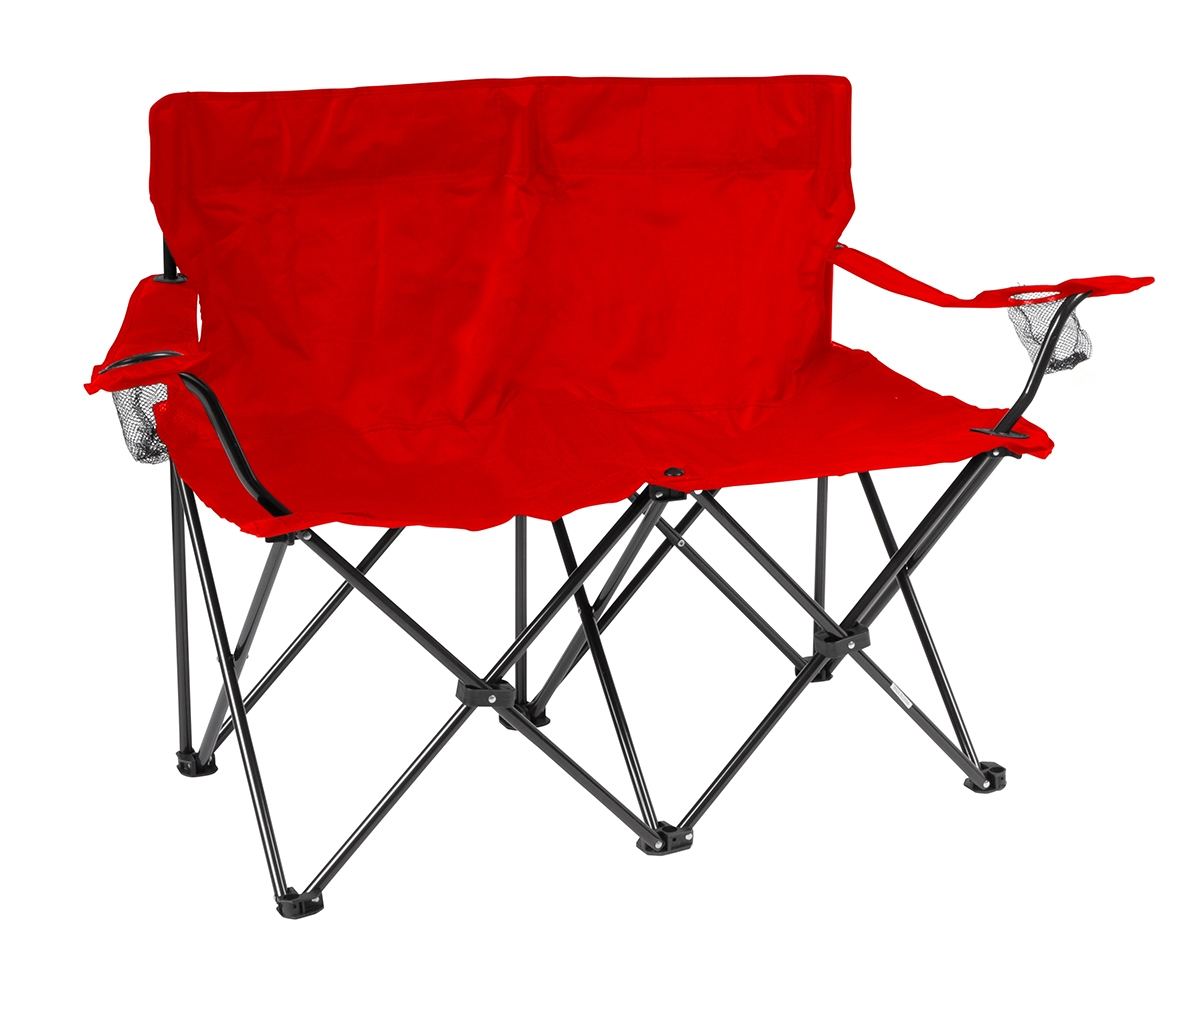 Db Seat Red 2 Jpg 1448028635